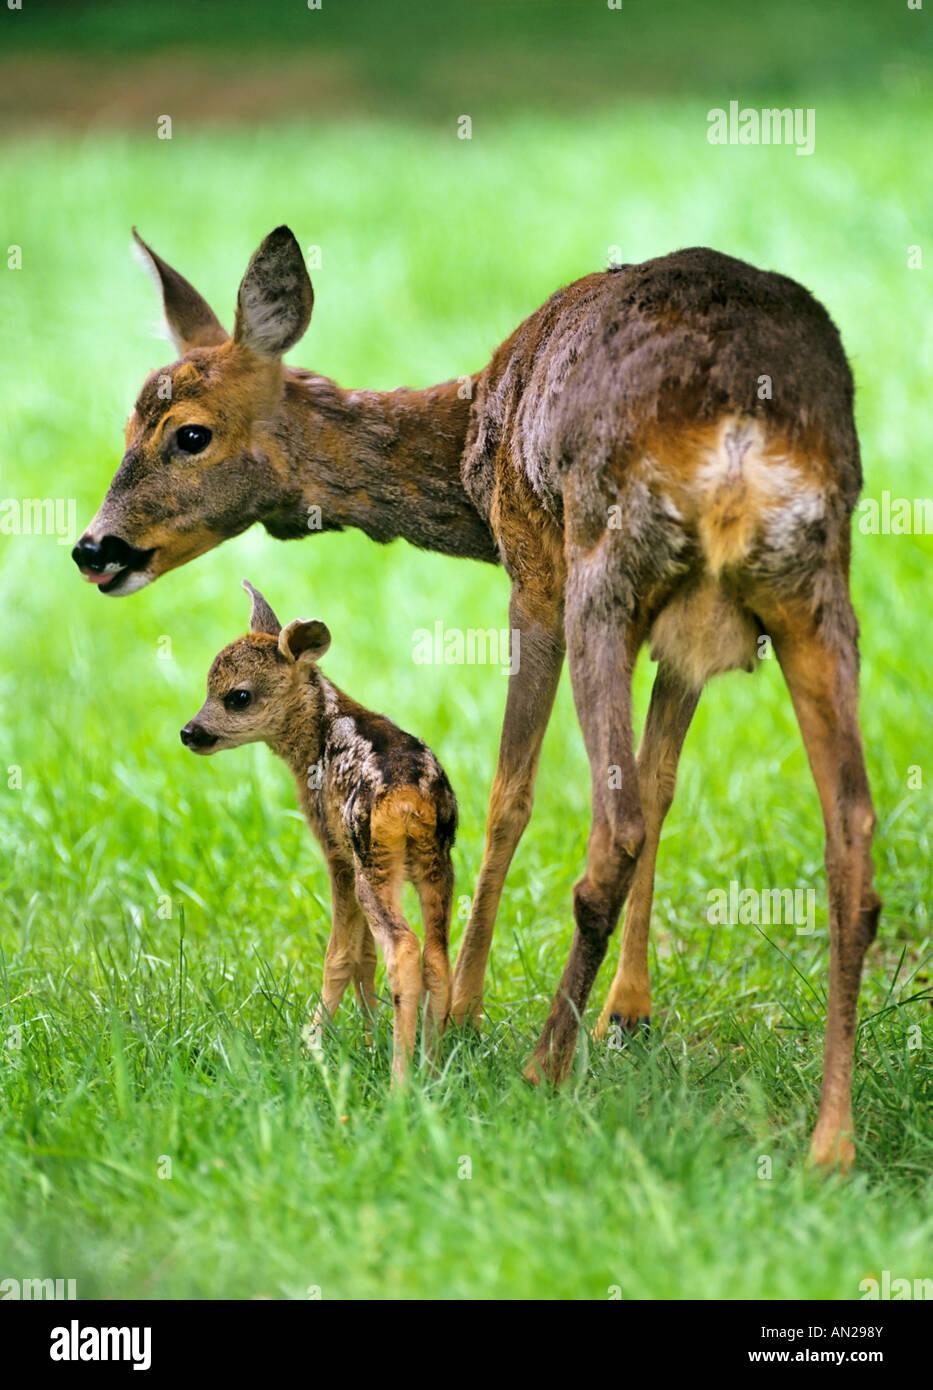 Rehe Ricke mit zwei Tage altem Kitz Capreolus capreolus Roe Deer with fawn - Stock Image